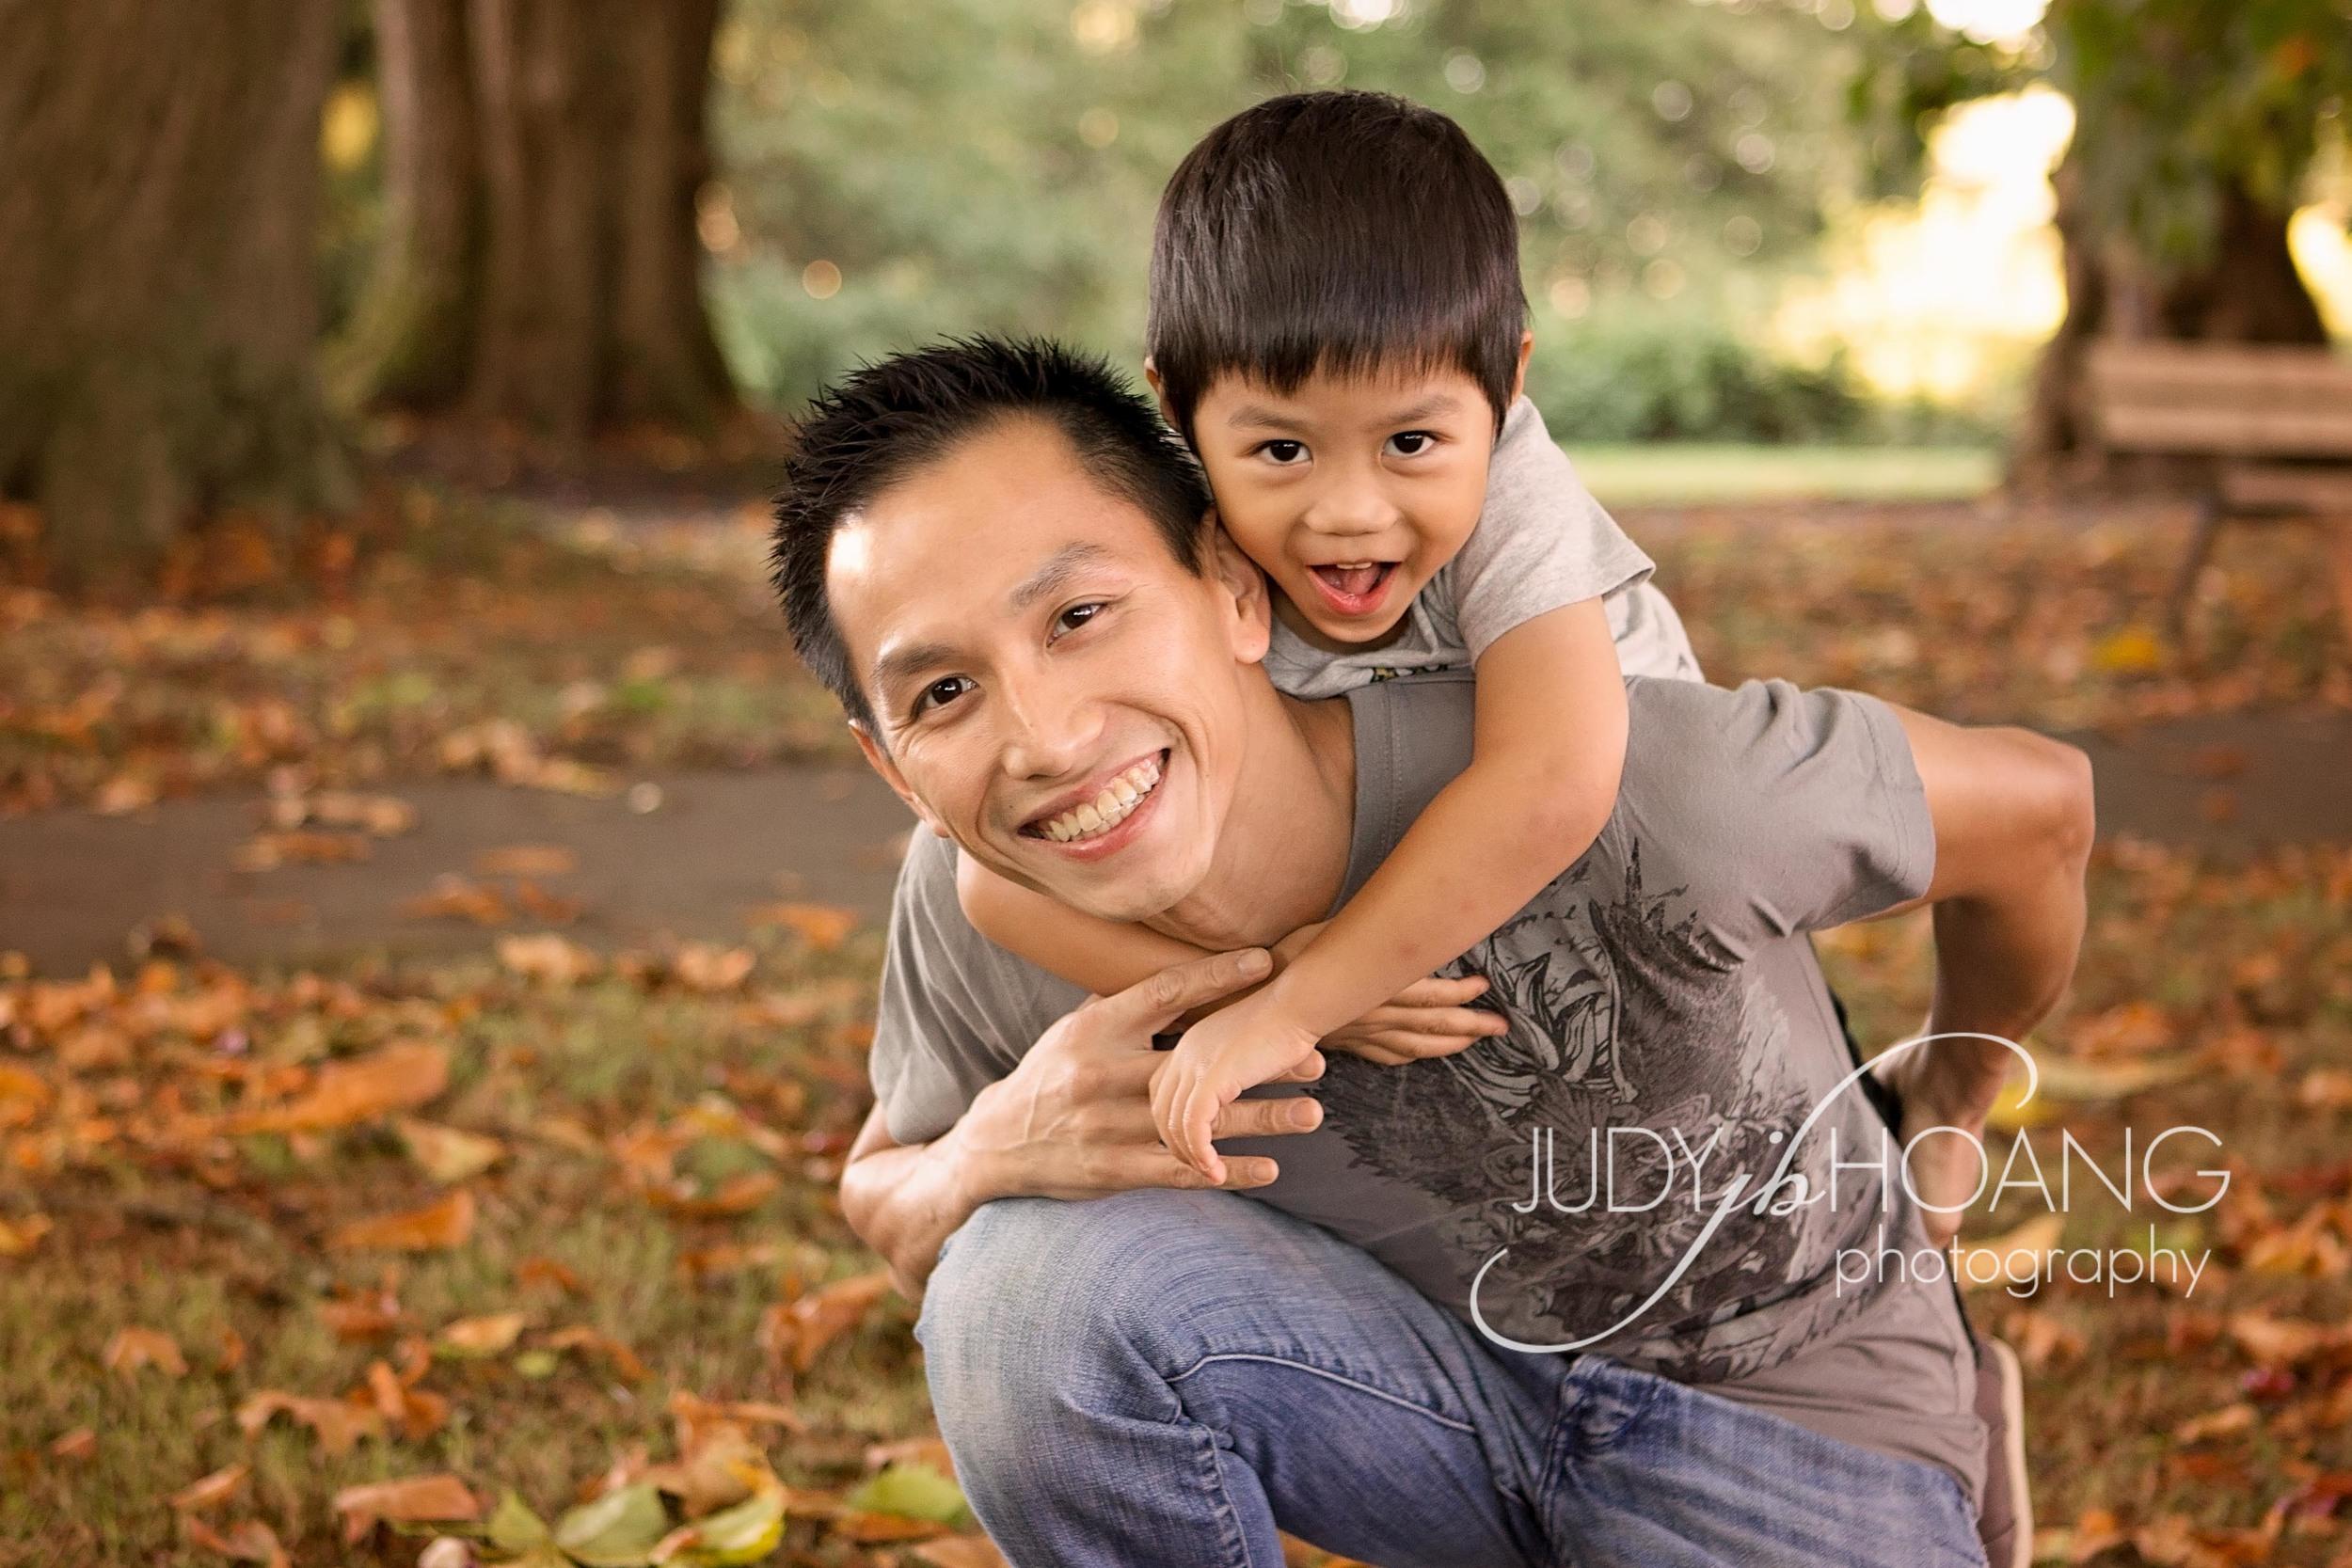 Judy Hoang Photography - Phan Family Portrait-5.JPG